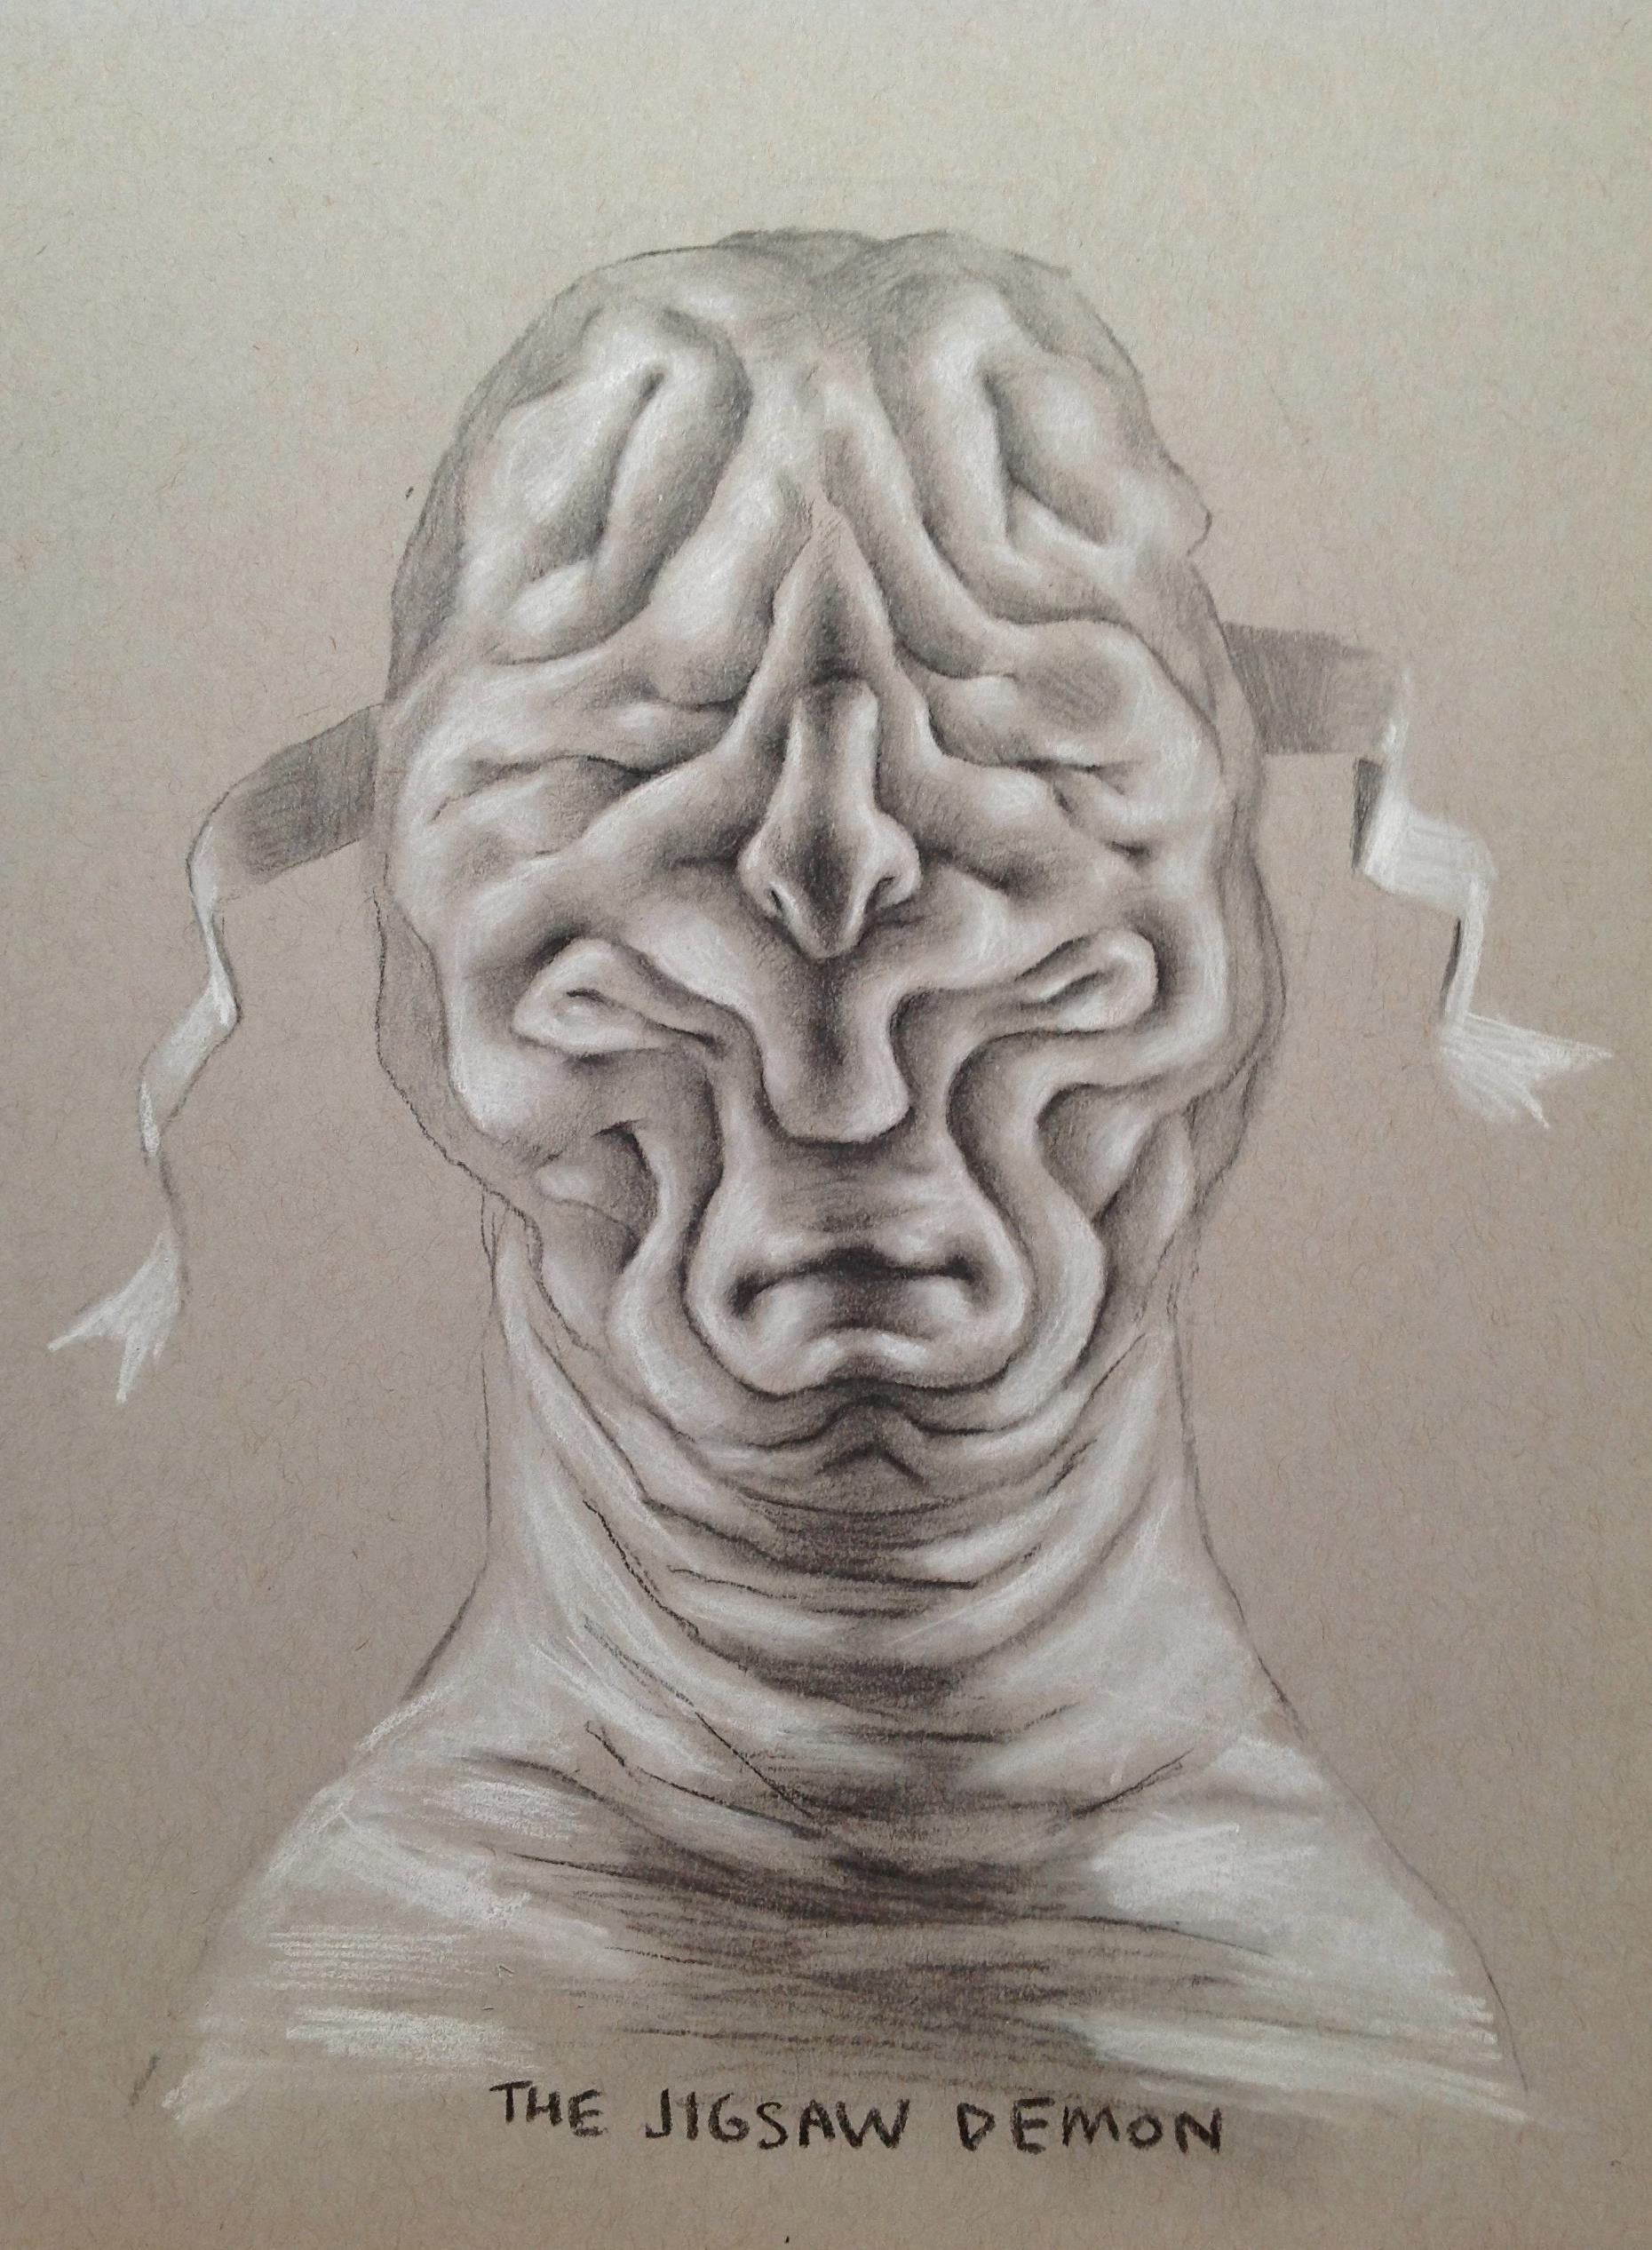 The Jigsaw Demon